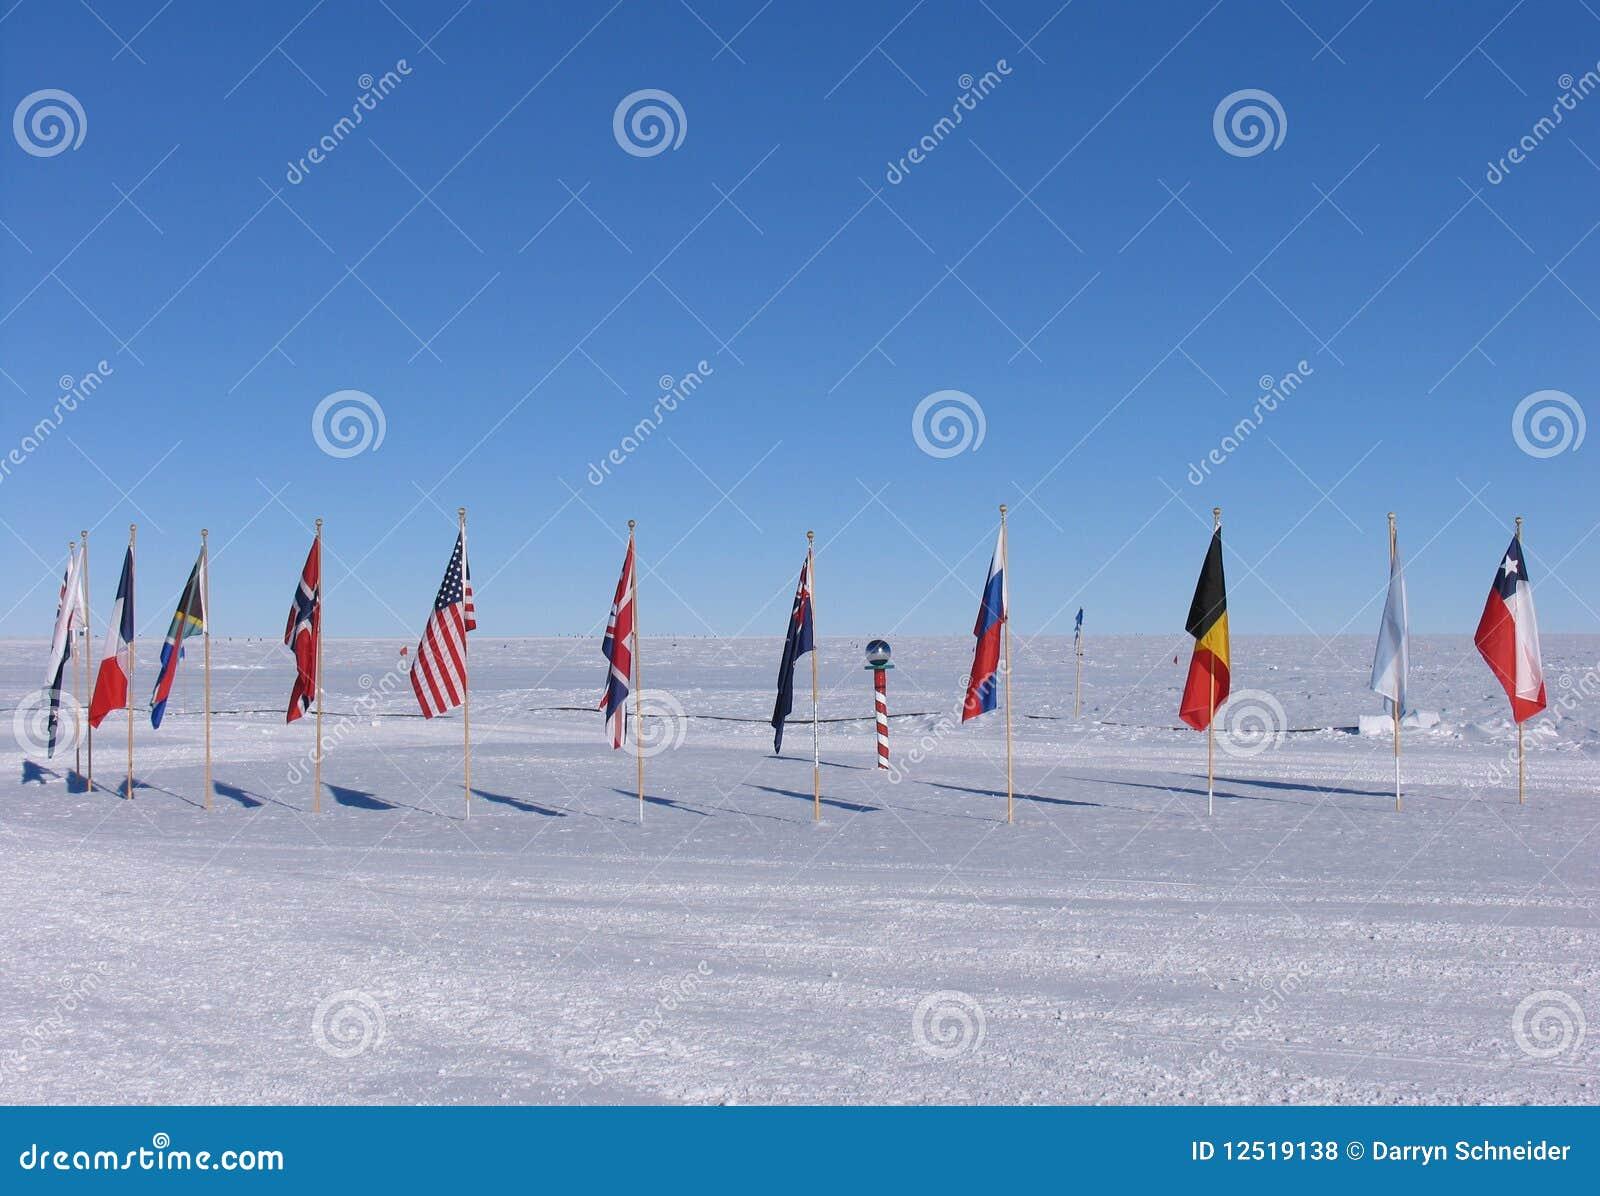 South Pole Flags